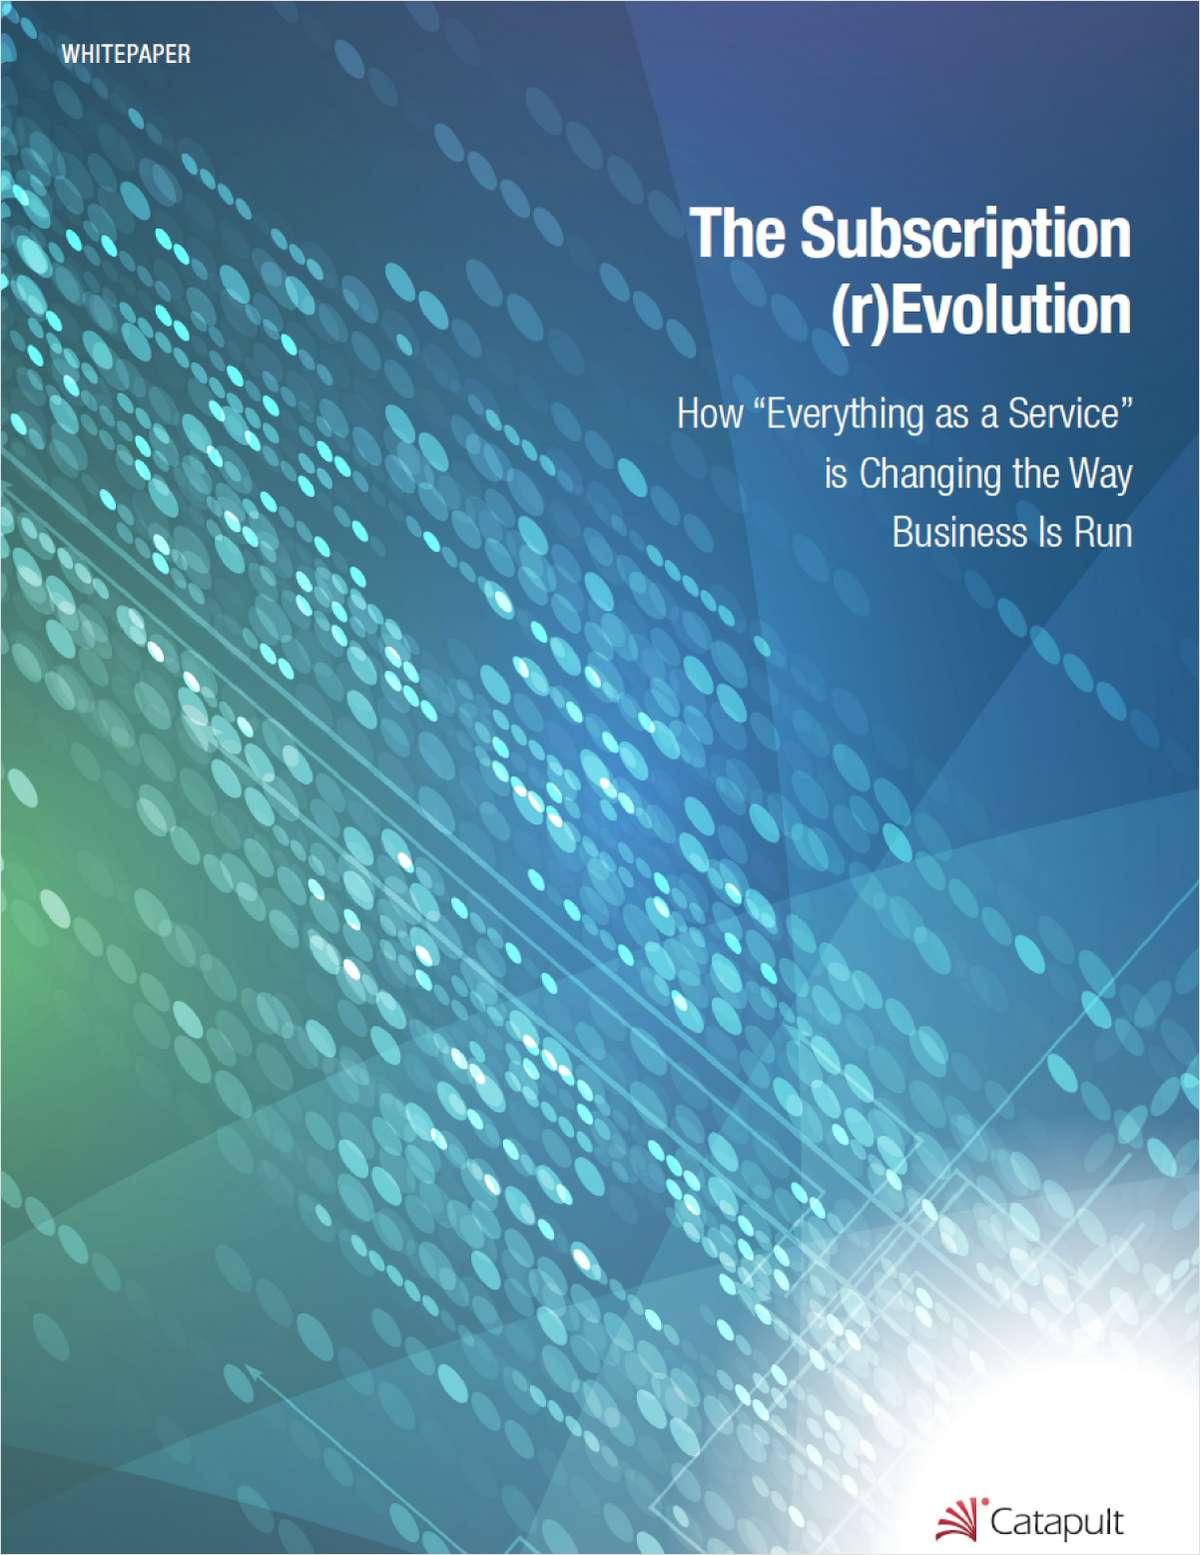 The Subscription Revolution